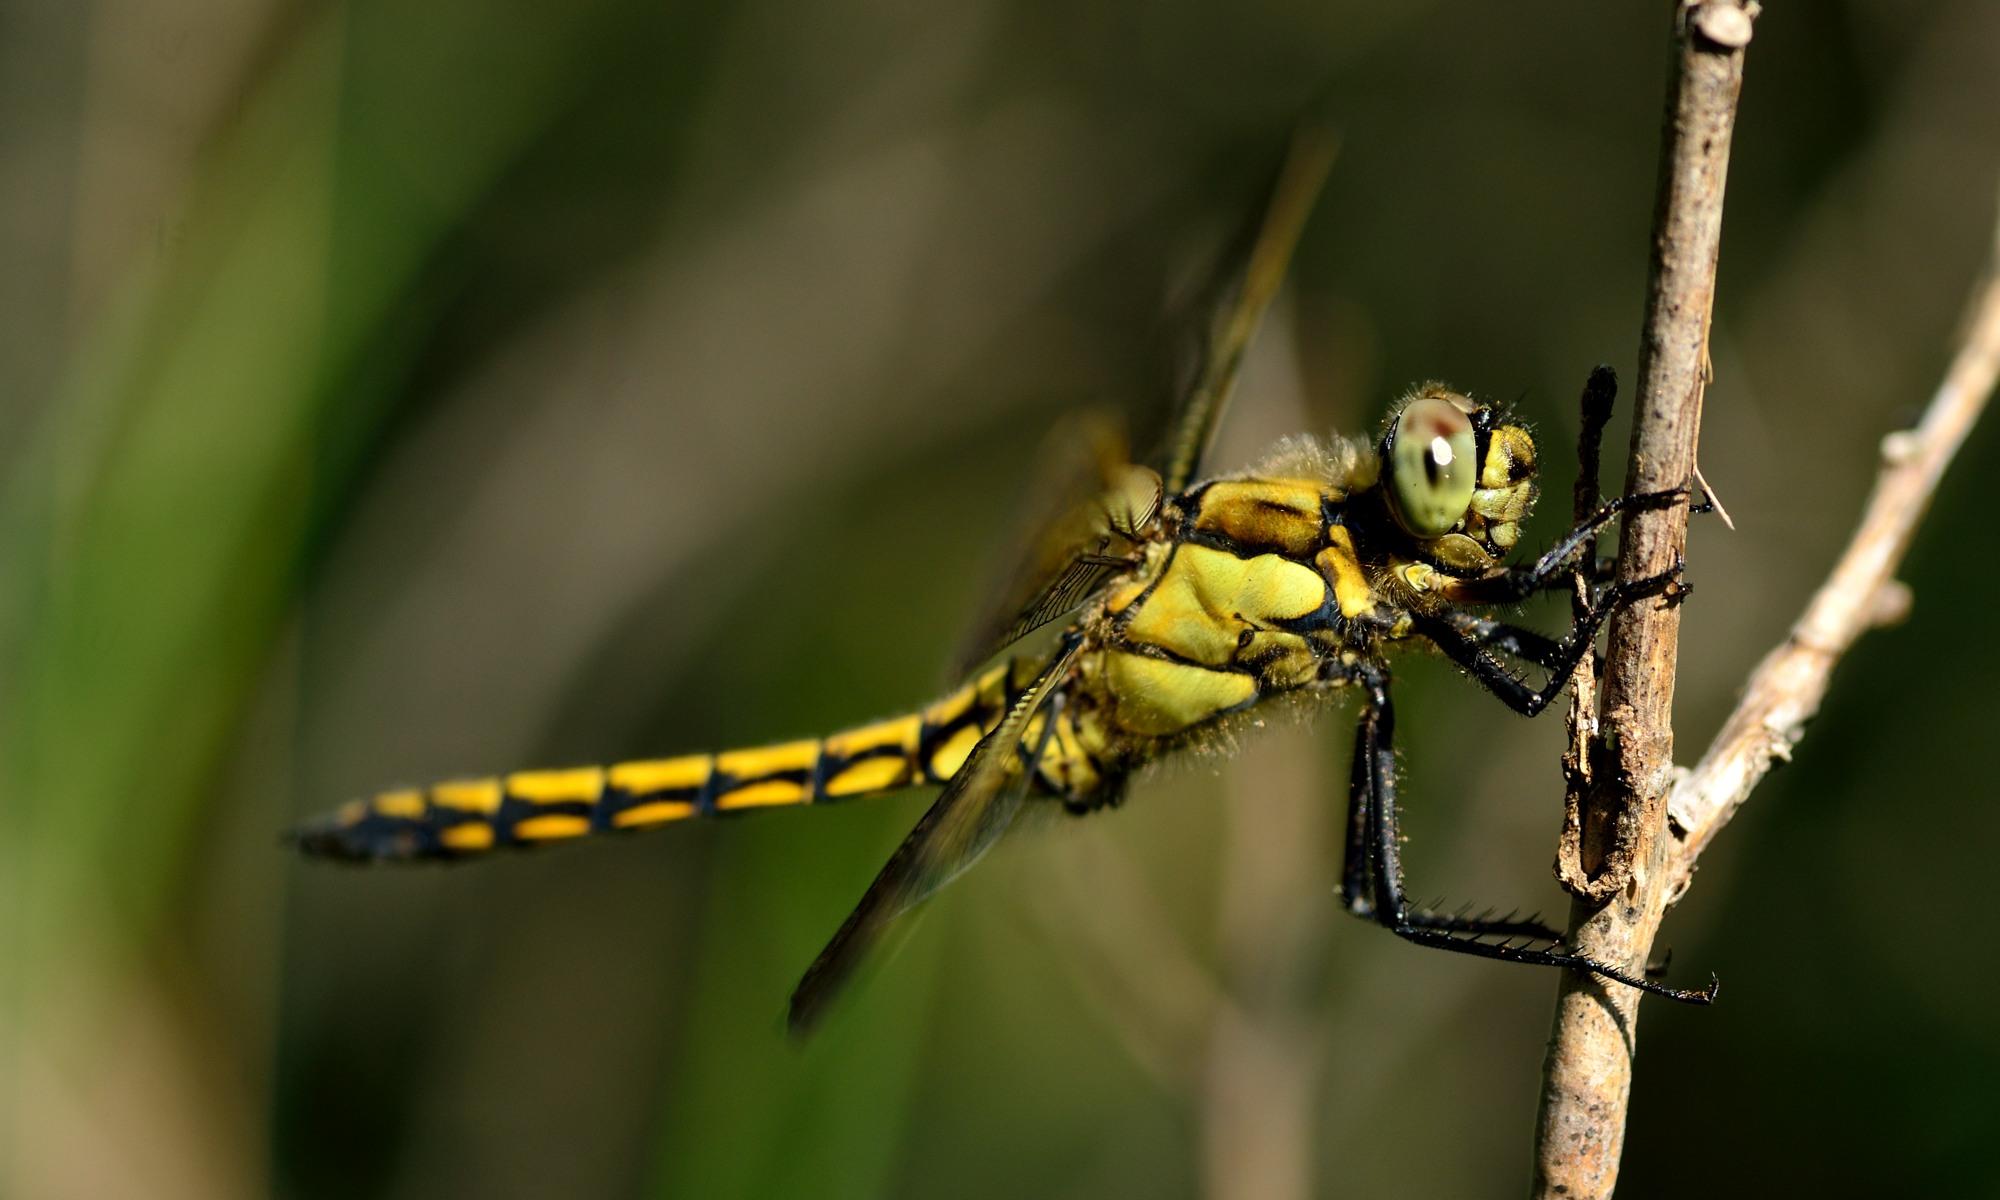 Libellulidae - Segellibellen